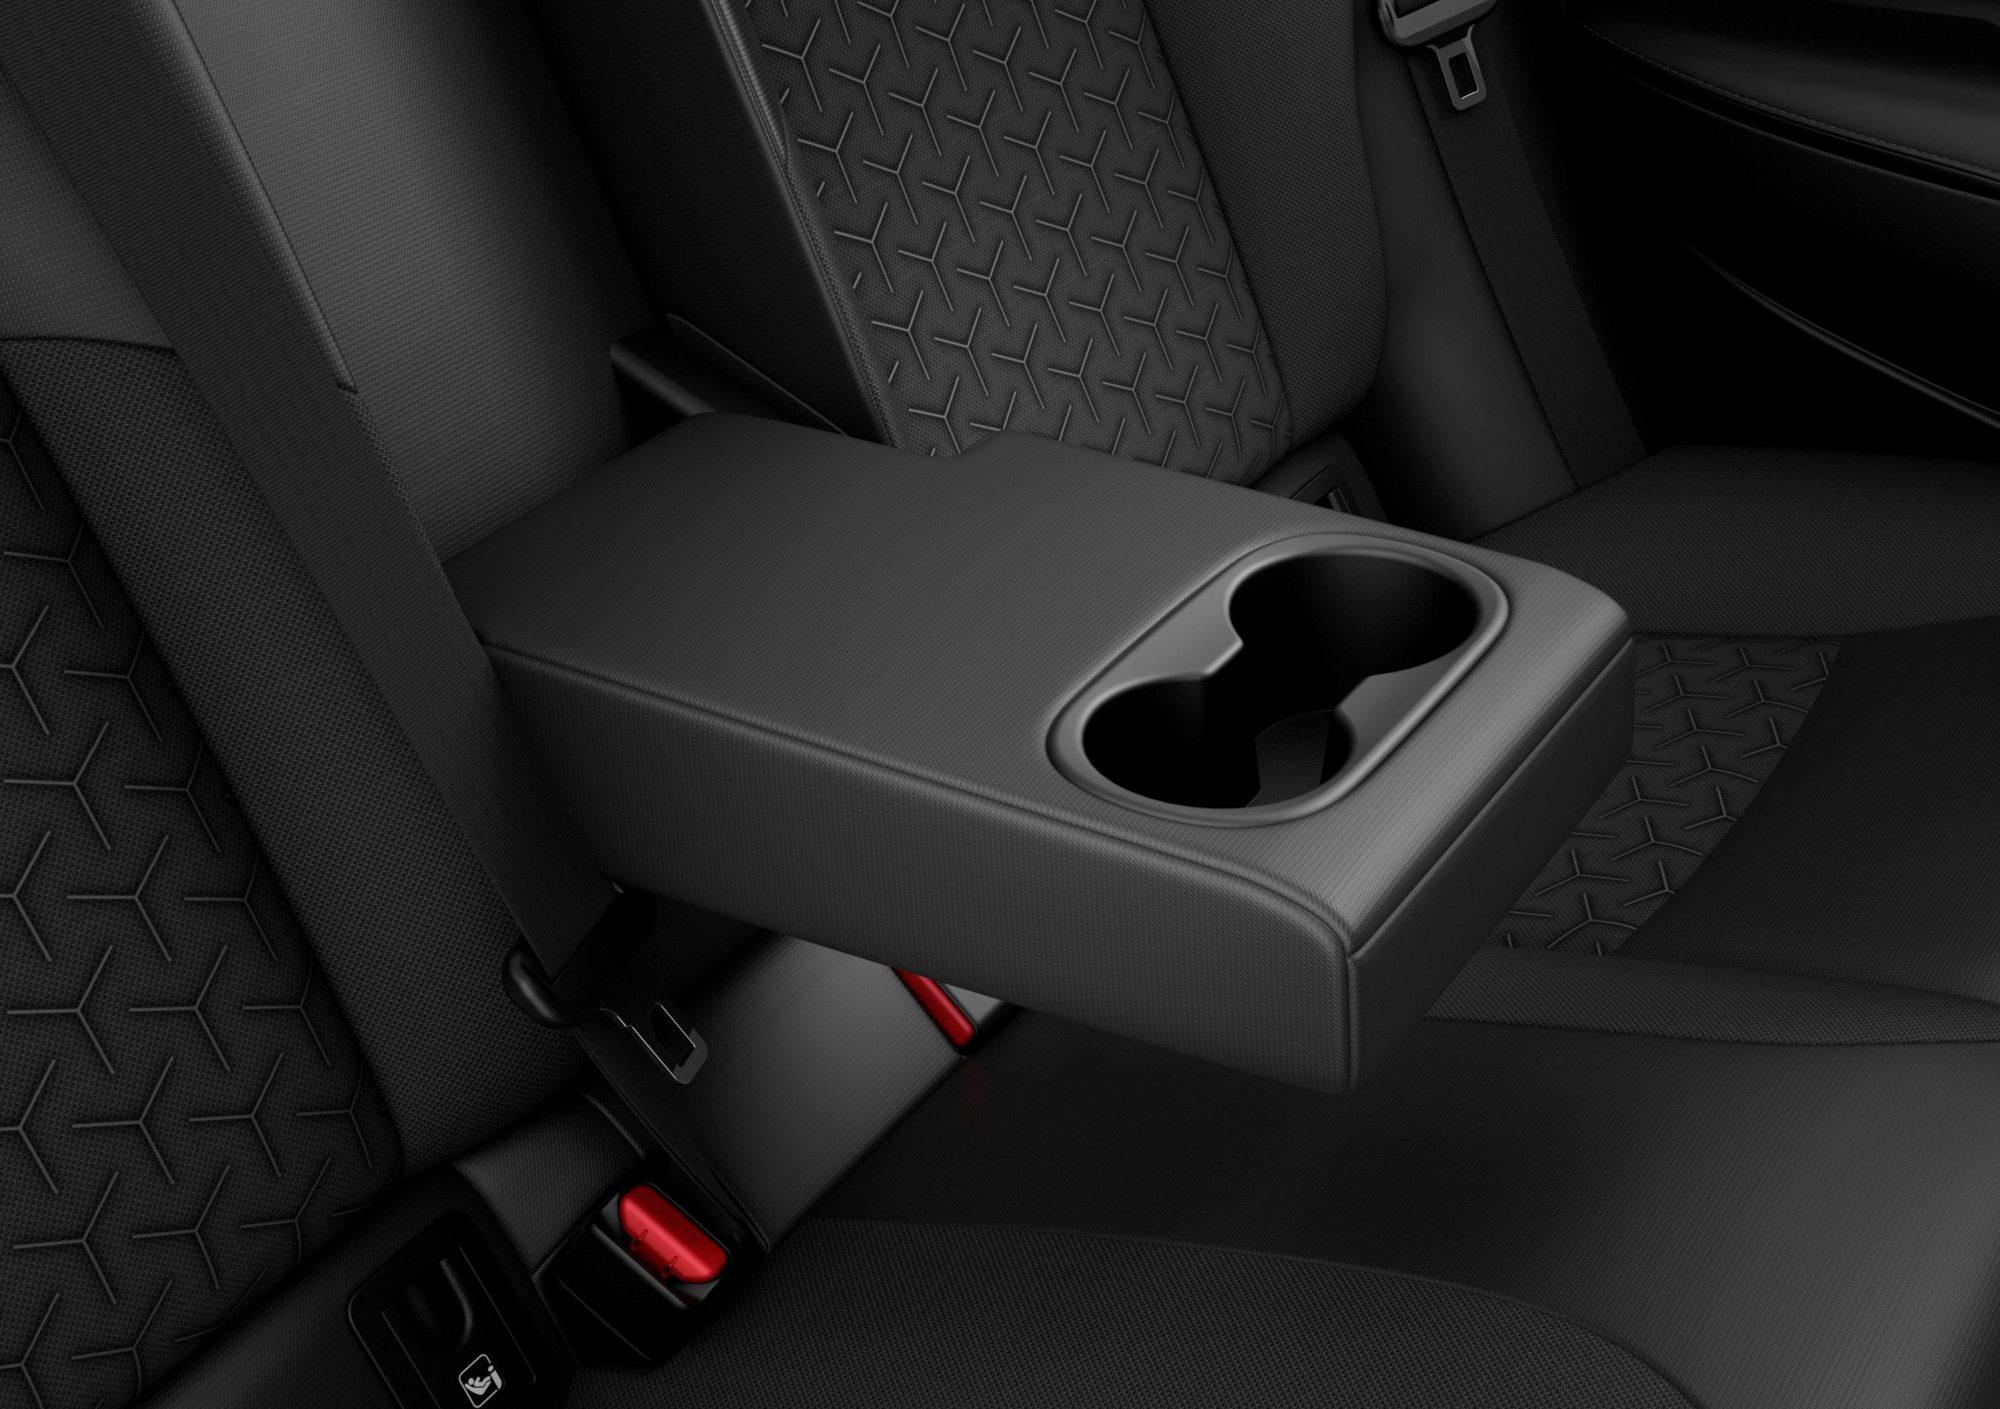 Suzuki Swace 2020 - Rear Centre Armrest